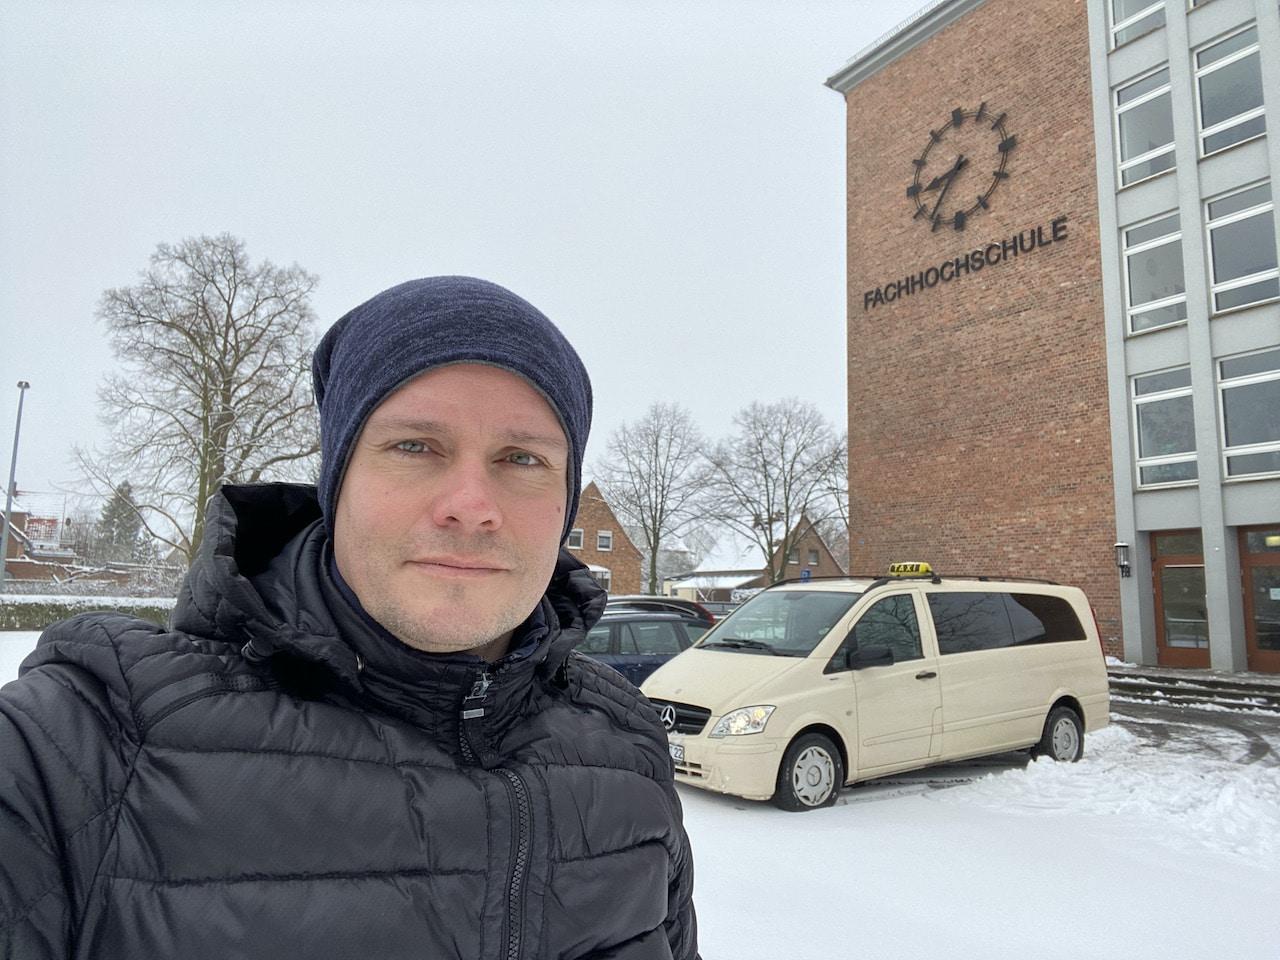 Taxi Rostock – Fahrt zur Fachhochschule